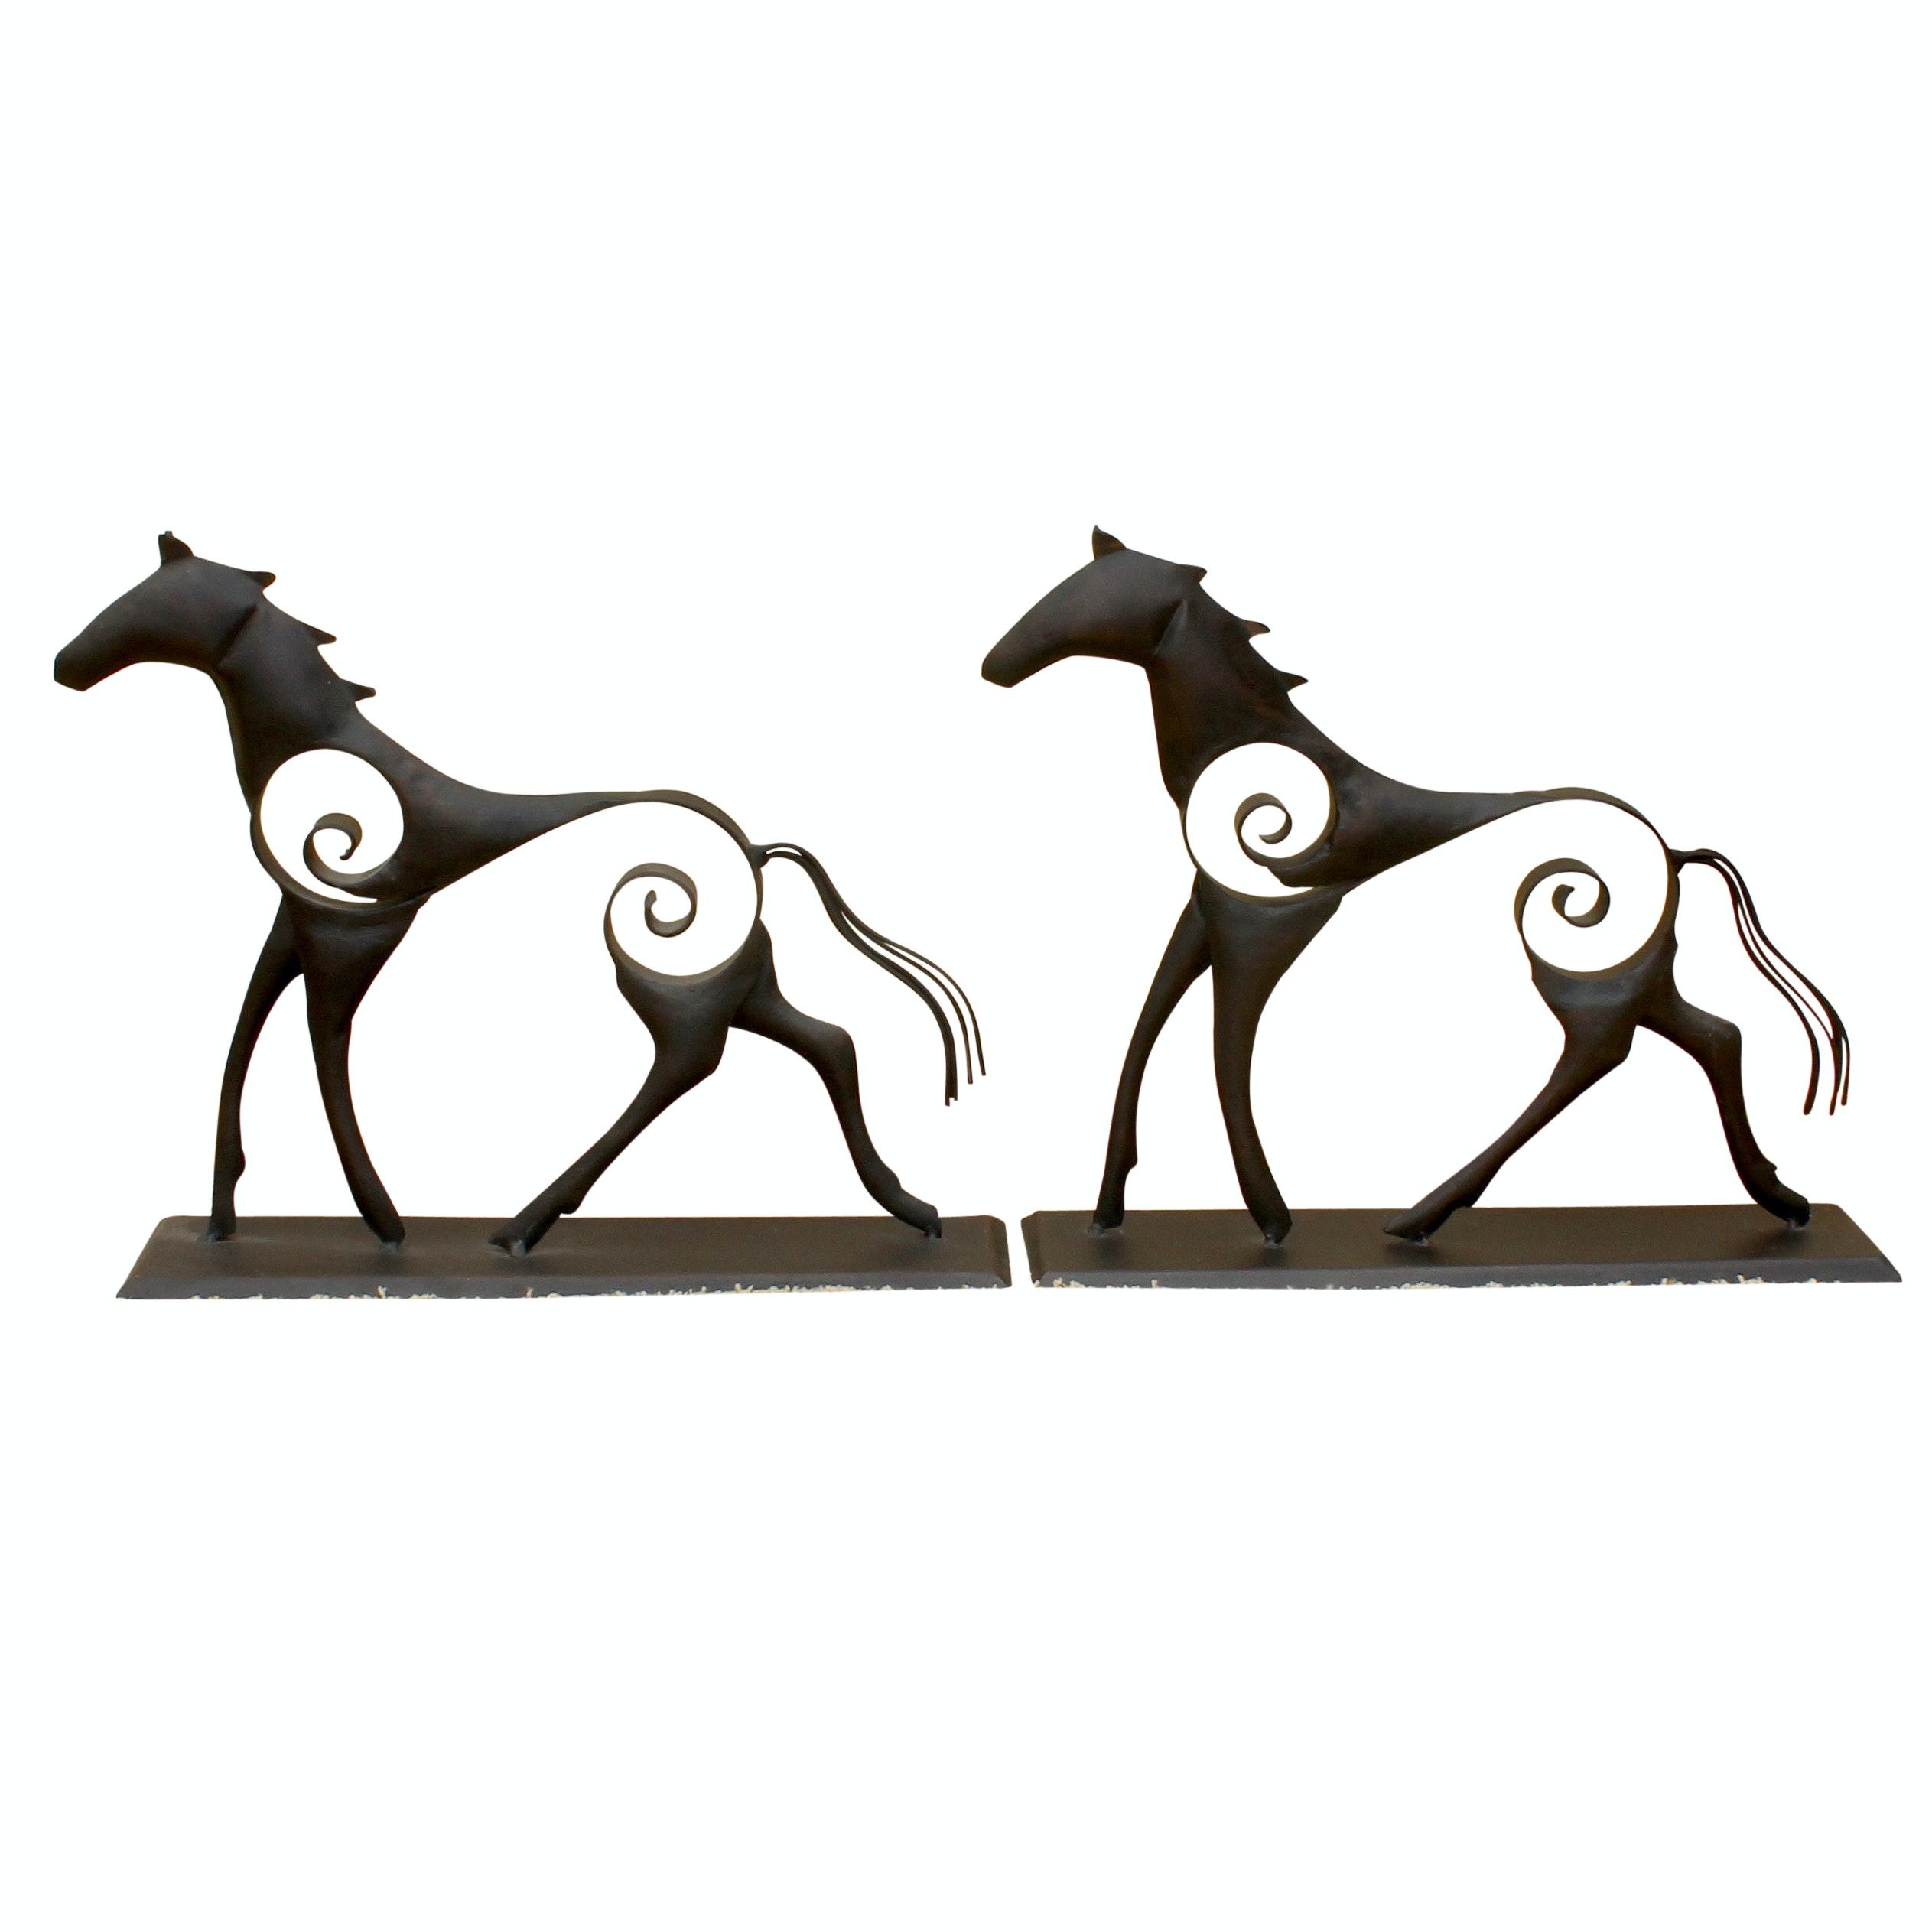 Contemporary Cast Metal Horse Sculptures